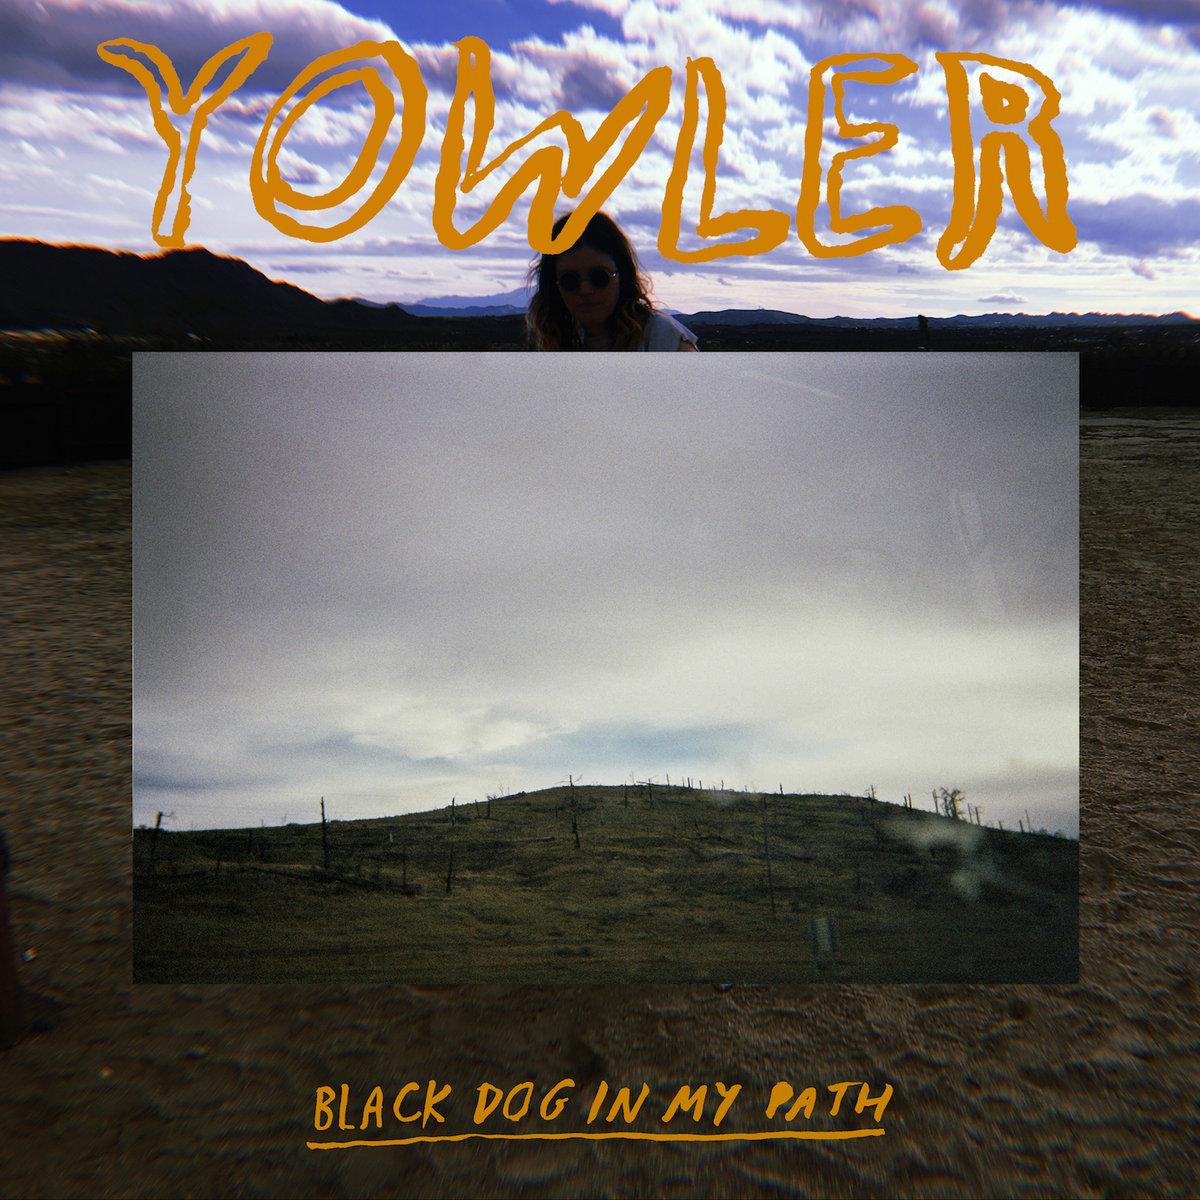 yowler black dog in my path album art